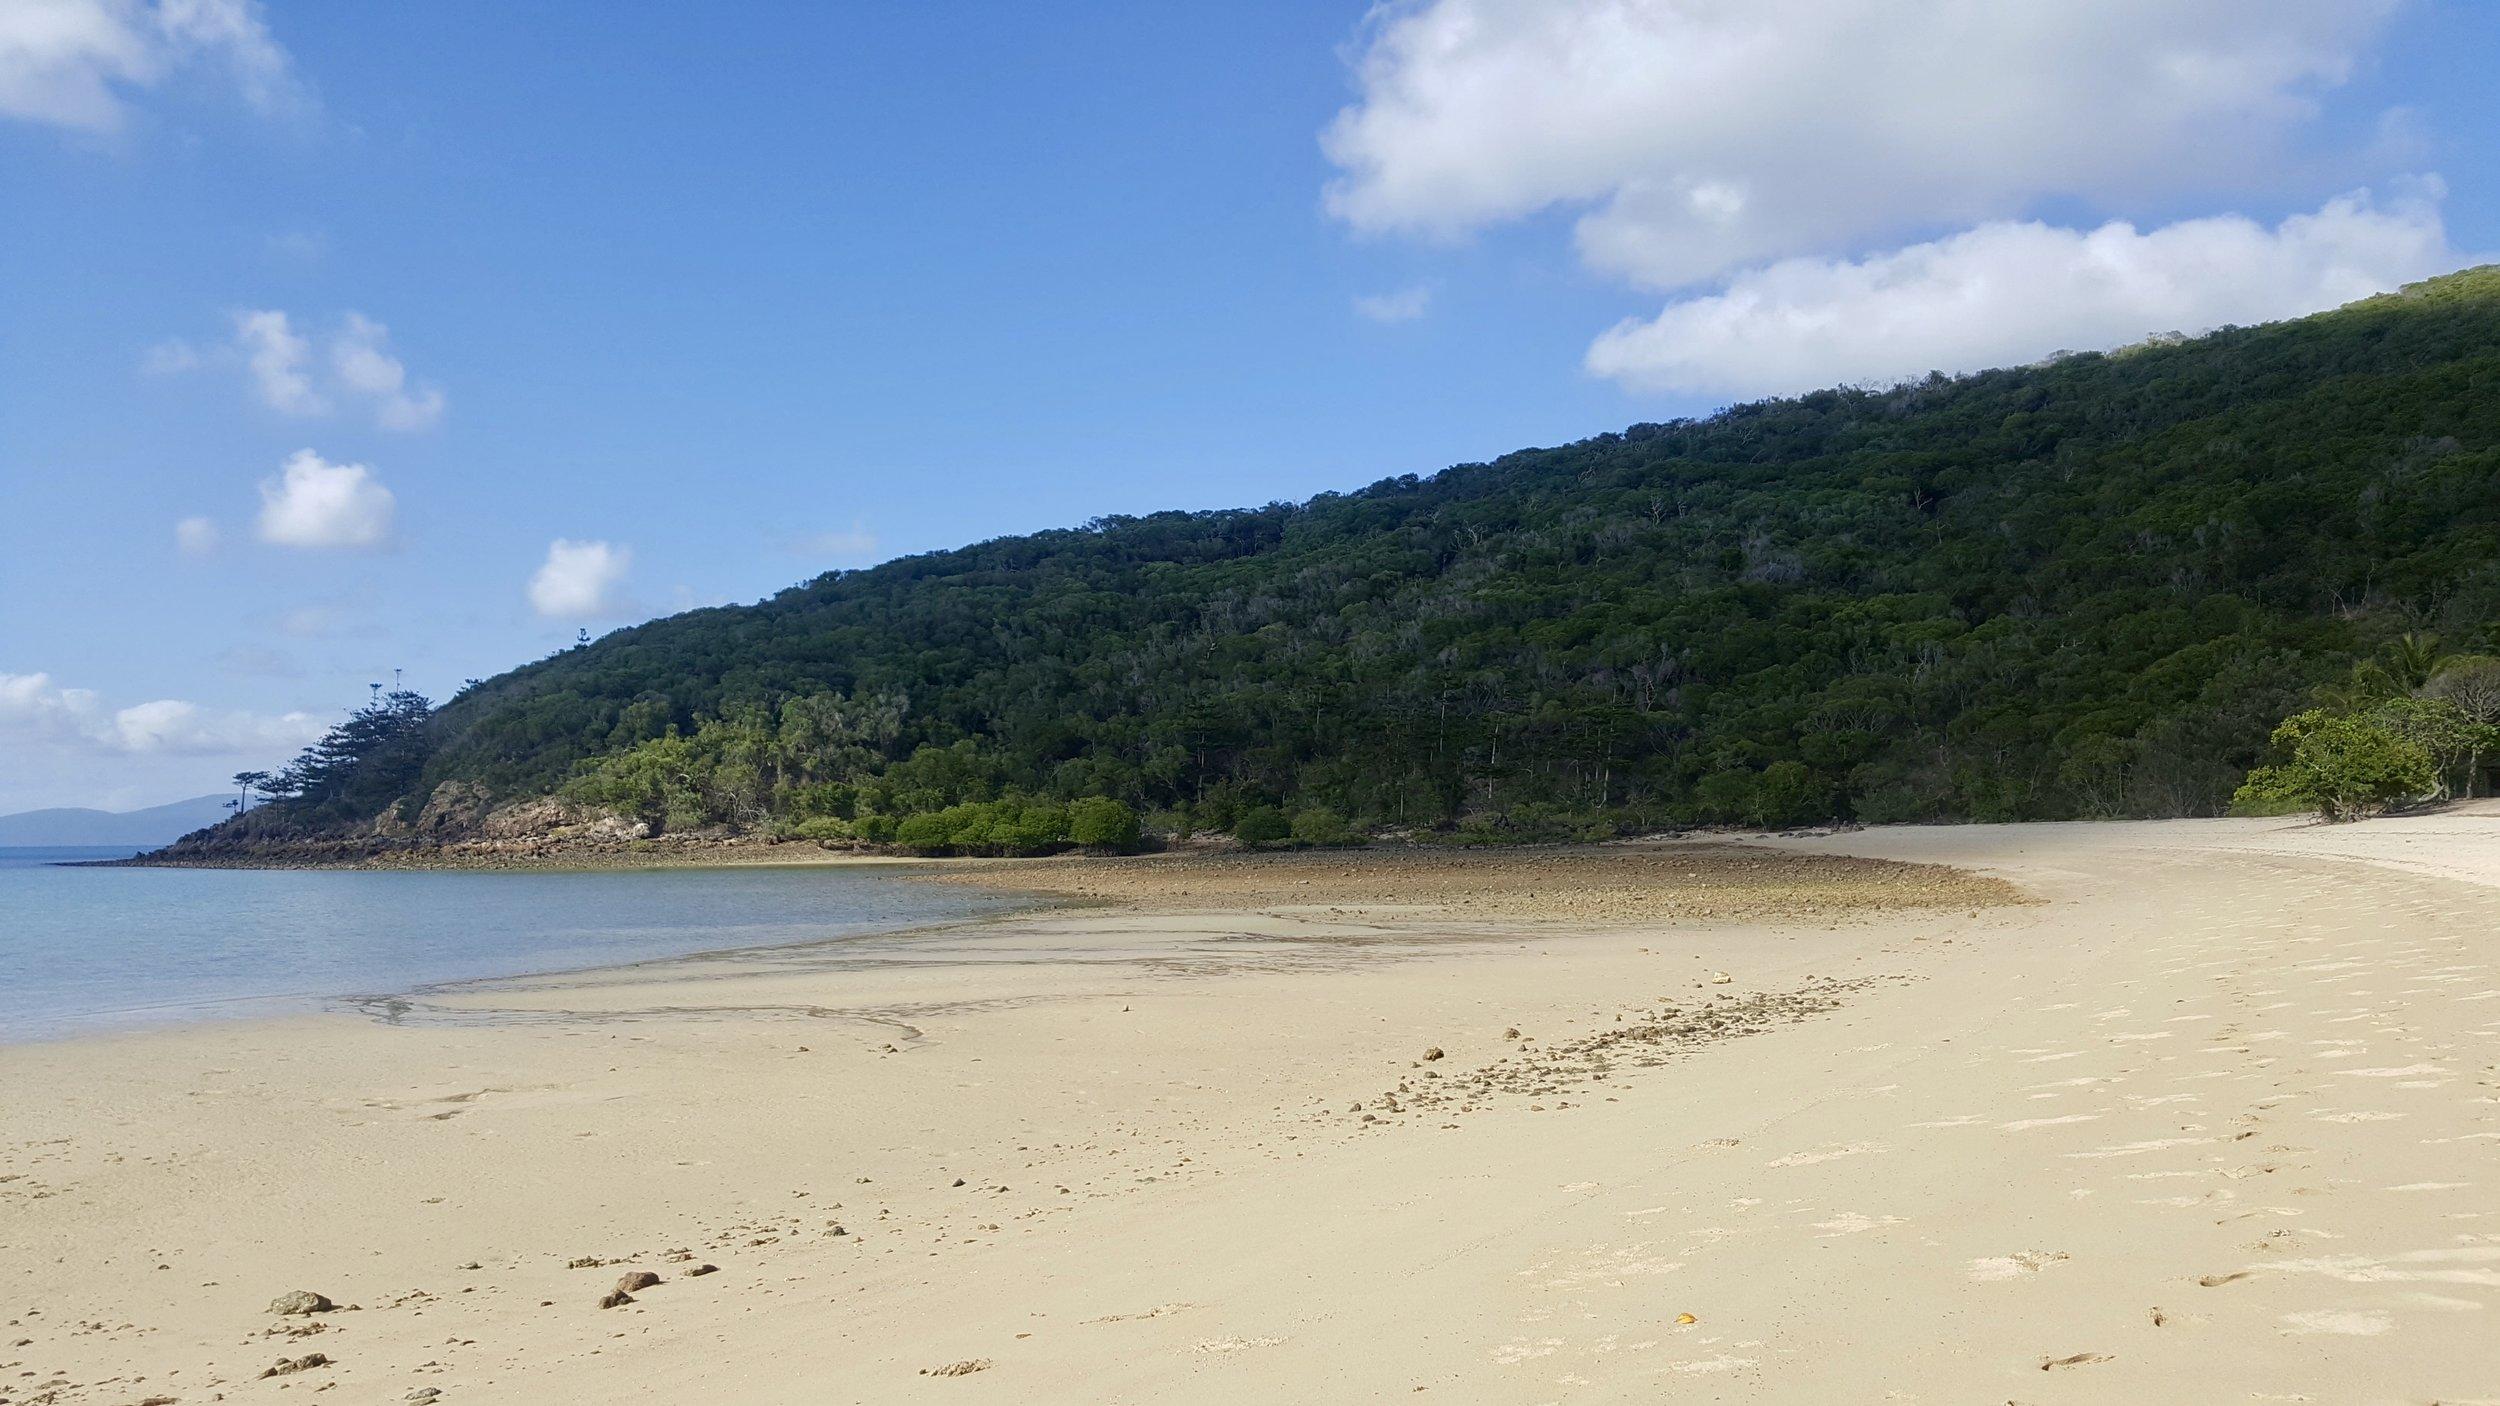 Coral Cove Beach, Hamilton Island, Whitsundays, Queensland, Australia